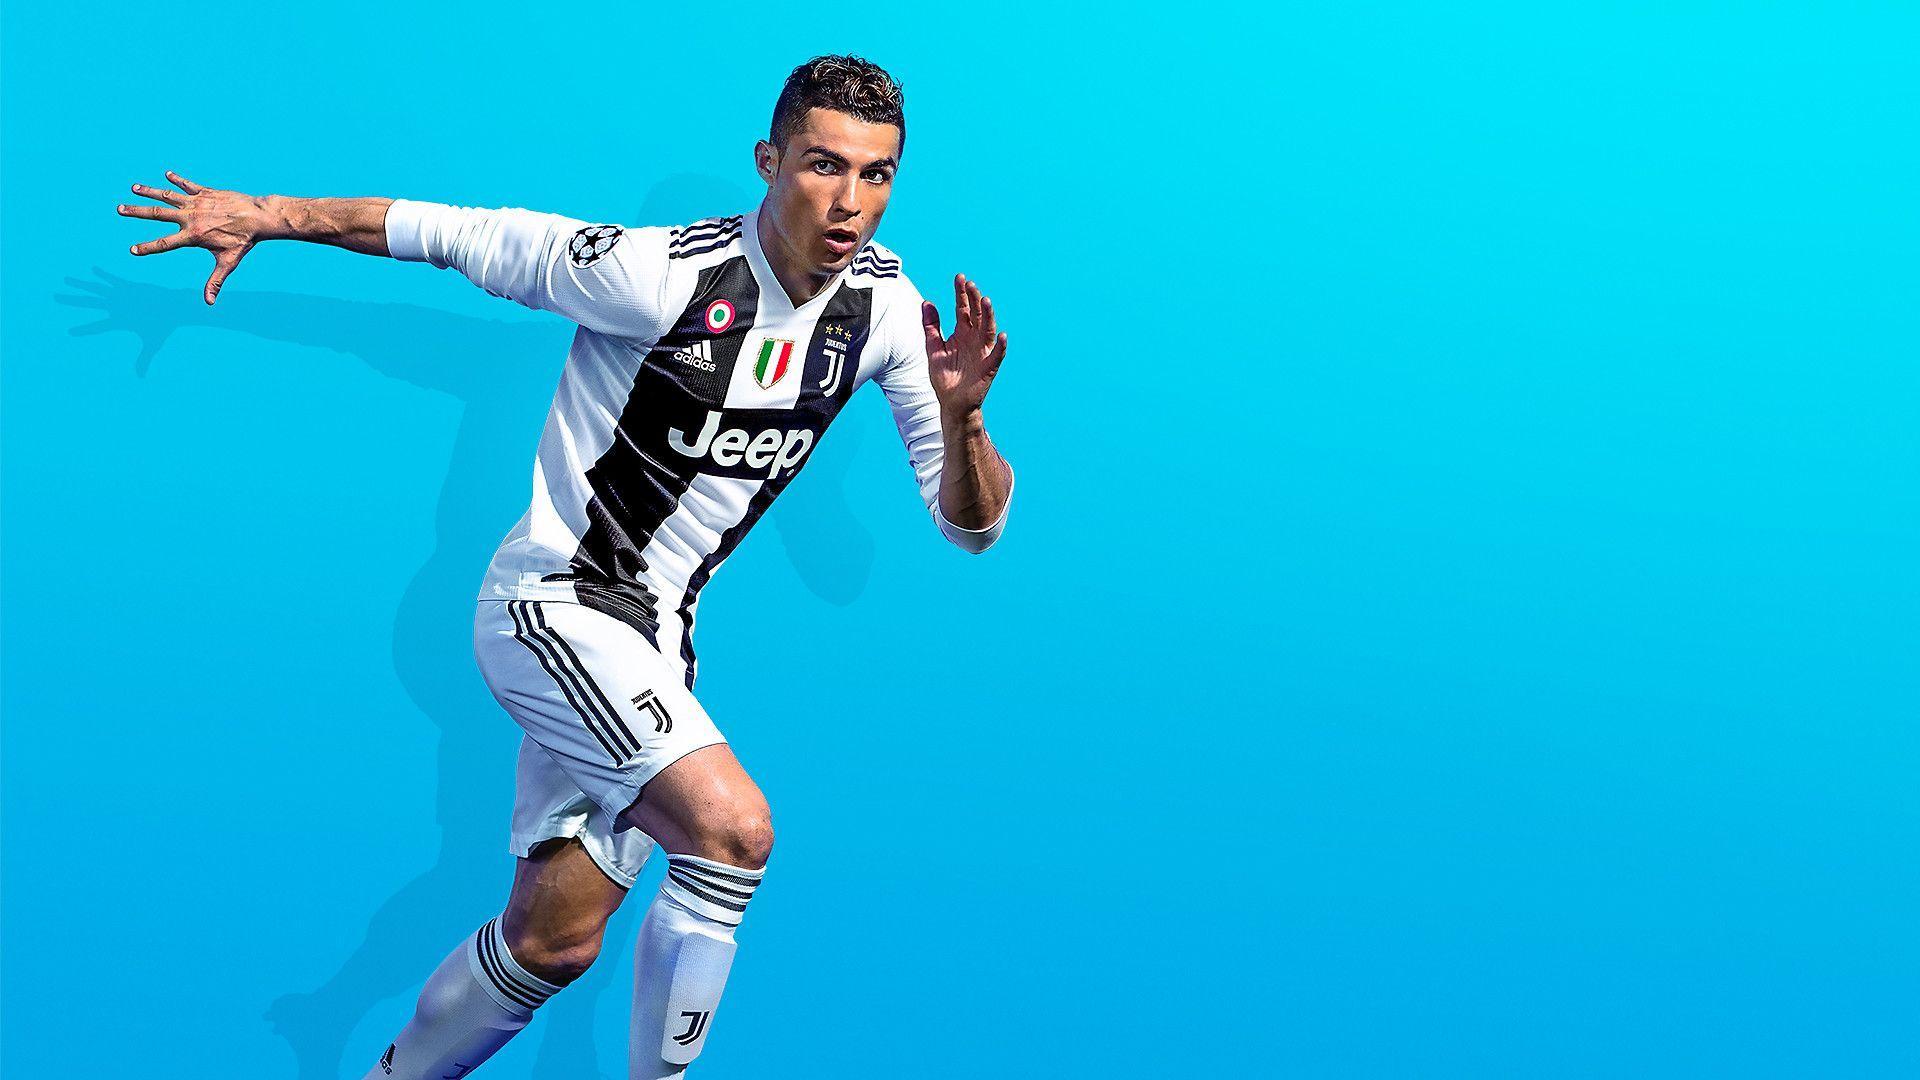 Fifa 19 Ronaldo Wallpapers - Top Free